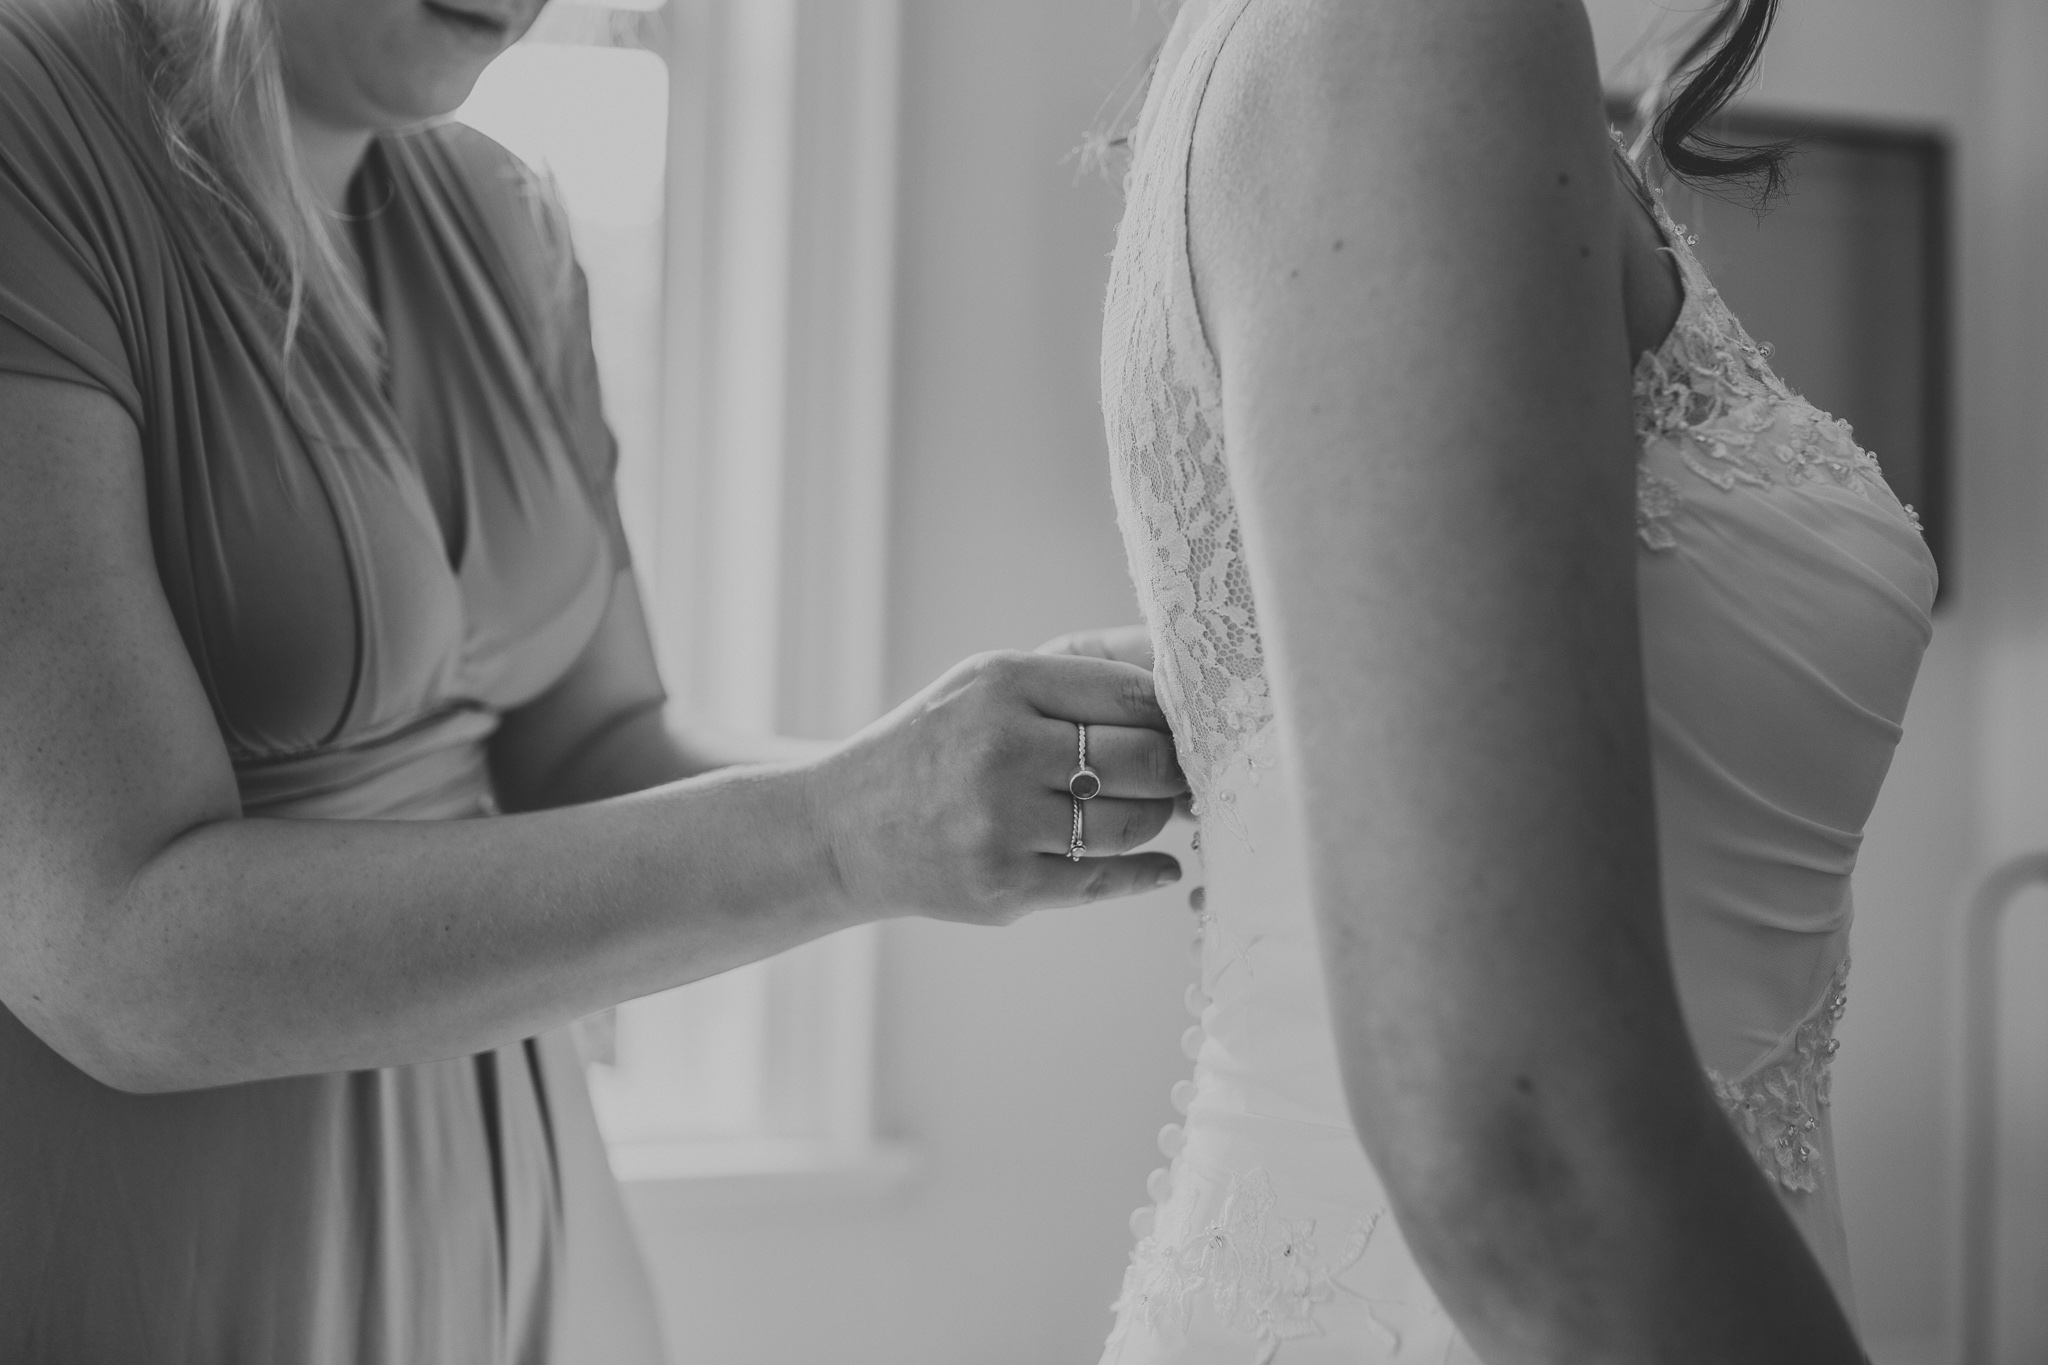 detail shot of buttoning wedding dress